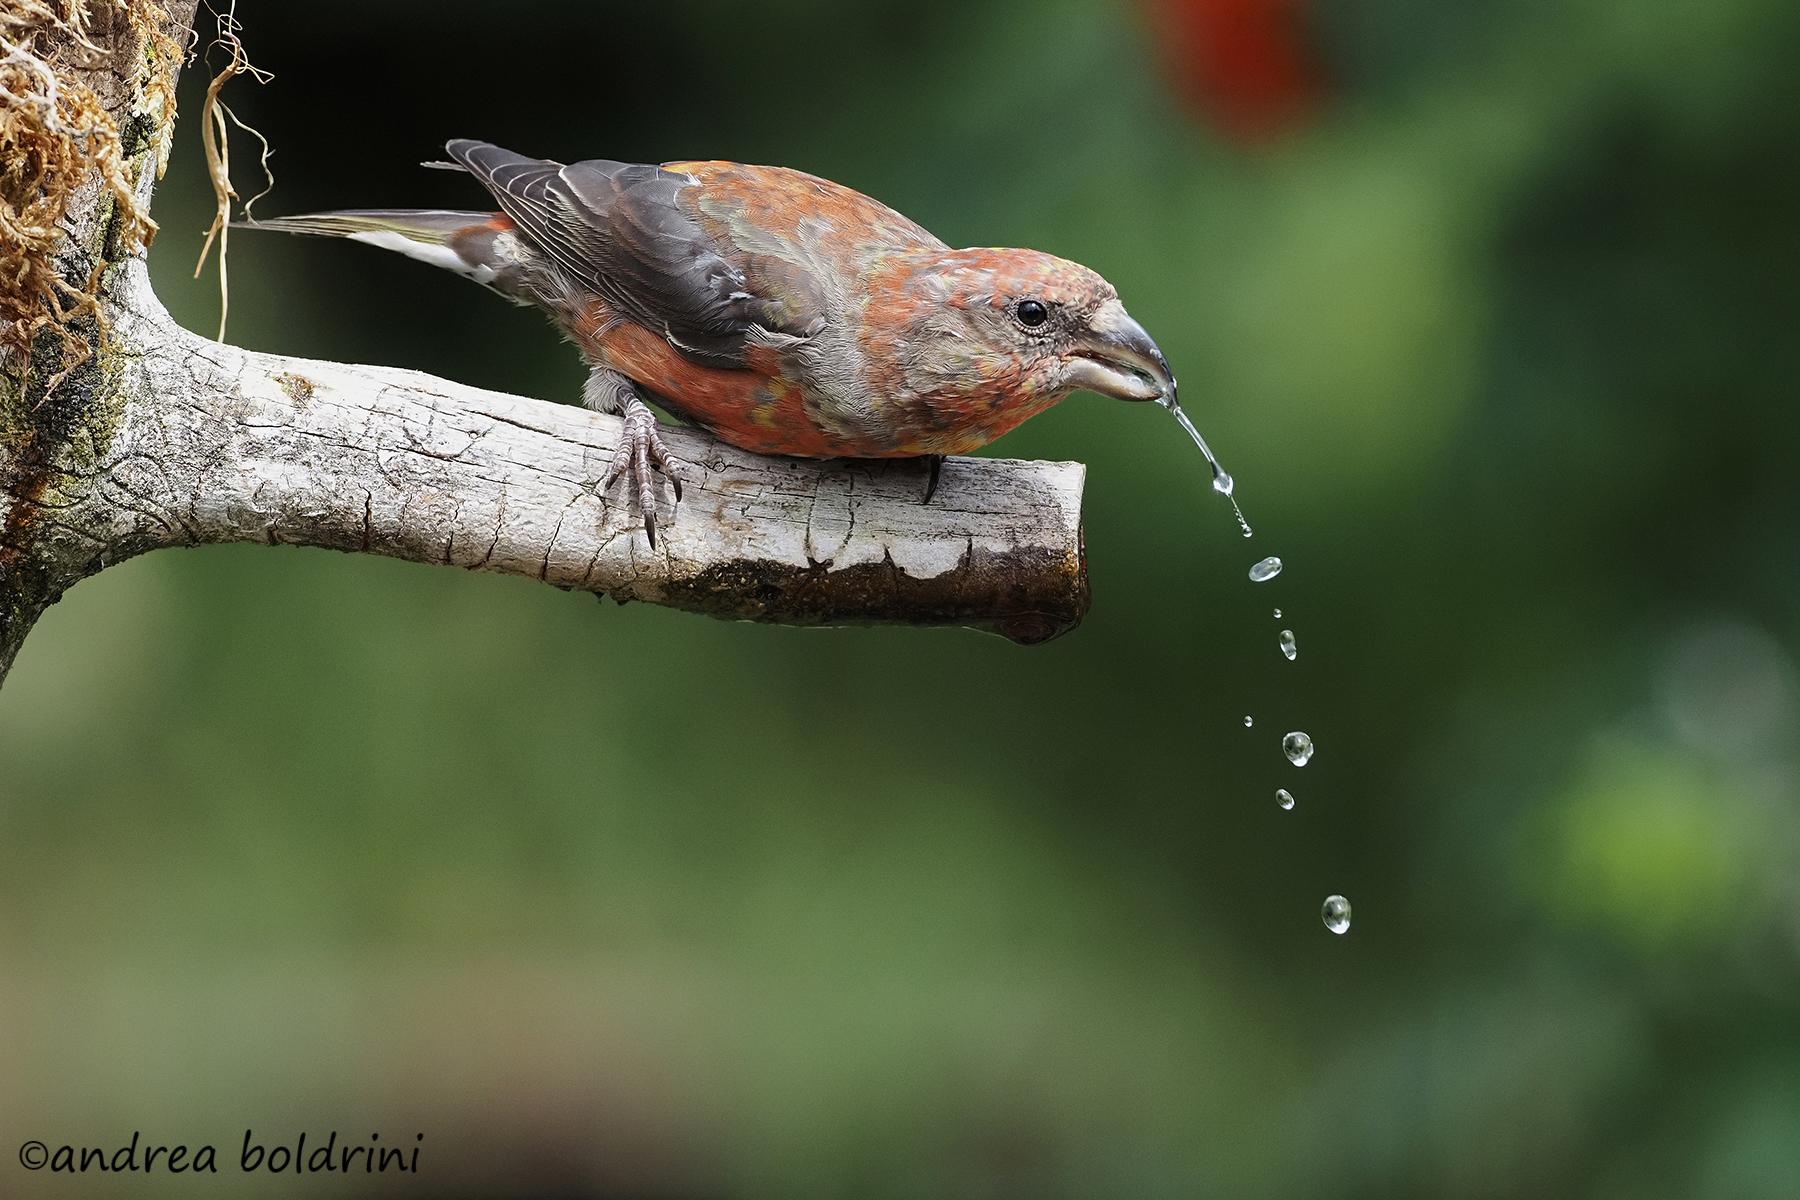 Thirsty...